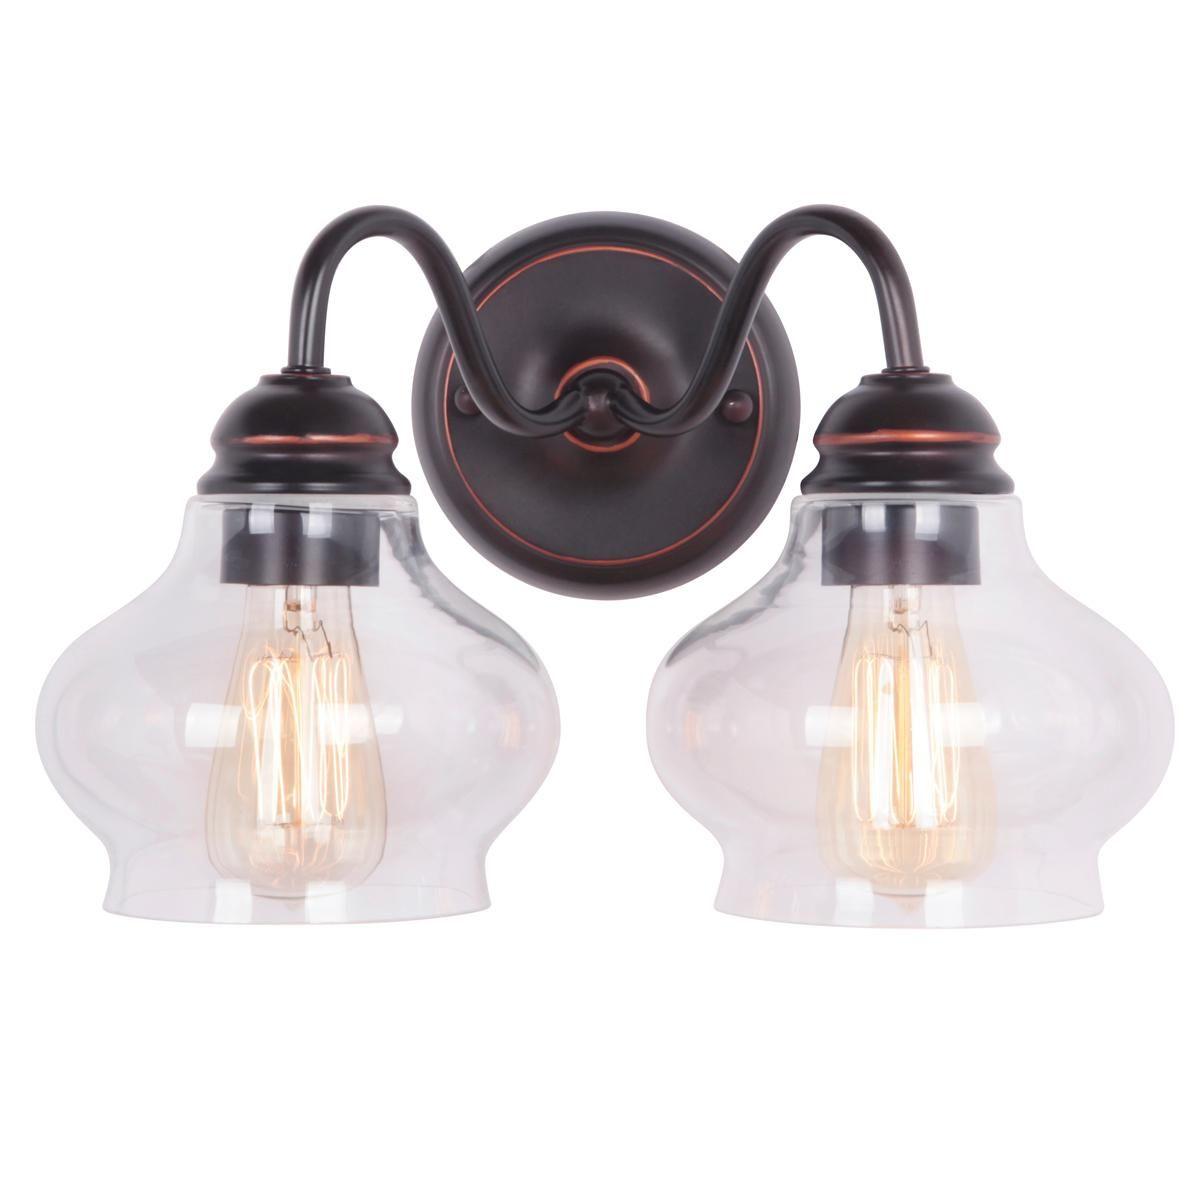 Clear Cloche Gl Bath Light 2 Onion Globes And Polished Nickel Or Bronze Hardware 2x60 Watts Medium Base Sockets 9 Hx13 5 Wx8 D Sku